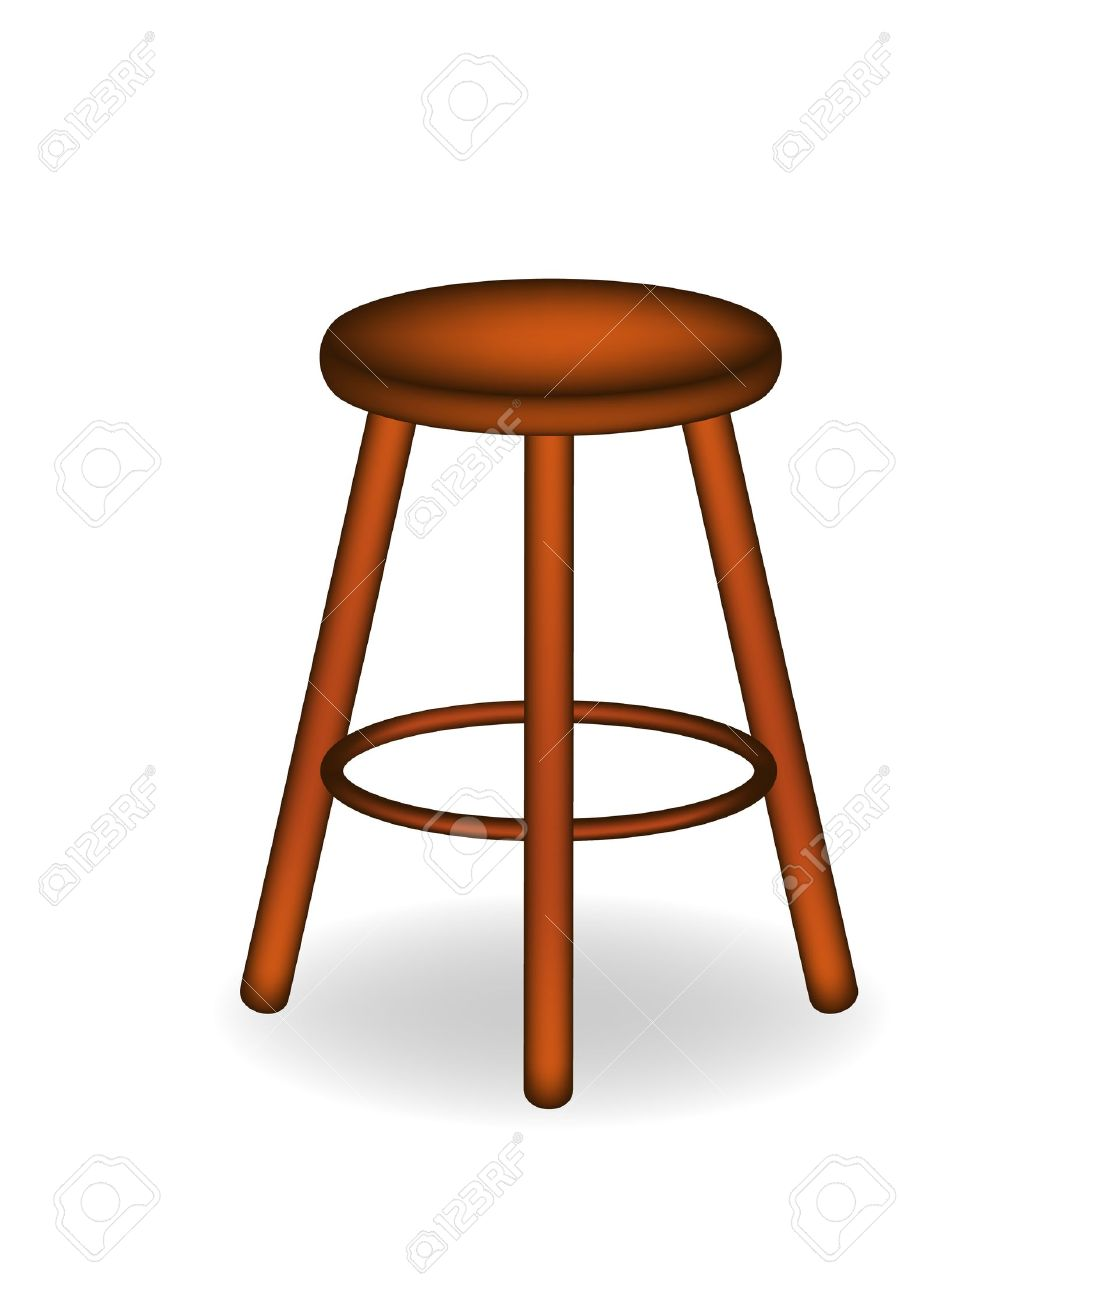 Retro wooden stool Stock Vector - 13394067